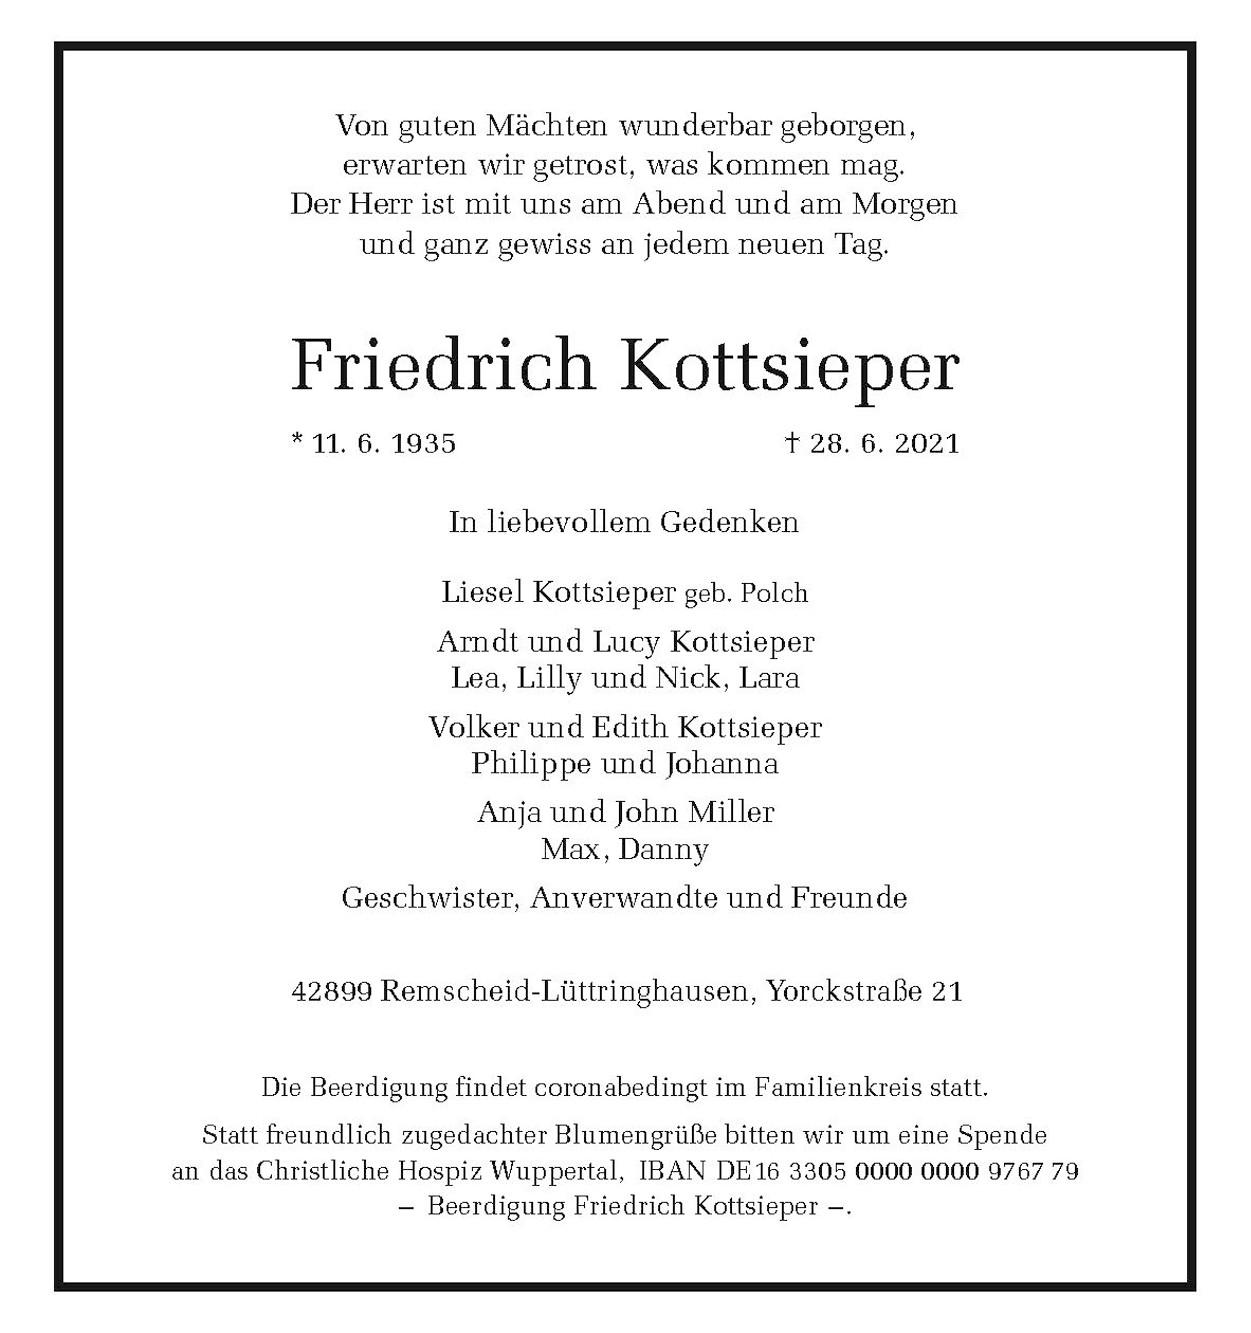 Friedrich Kottsieper